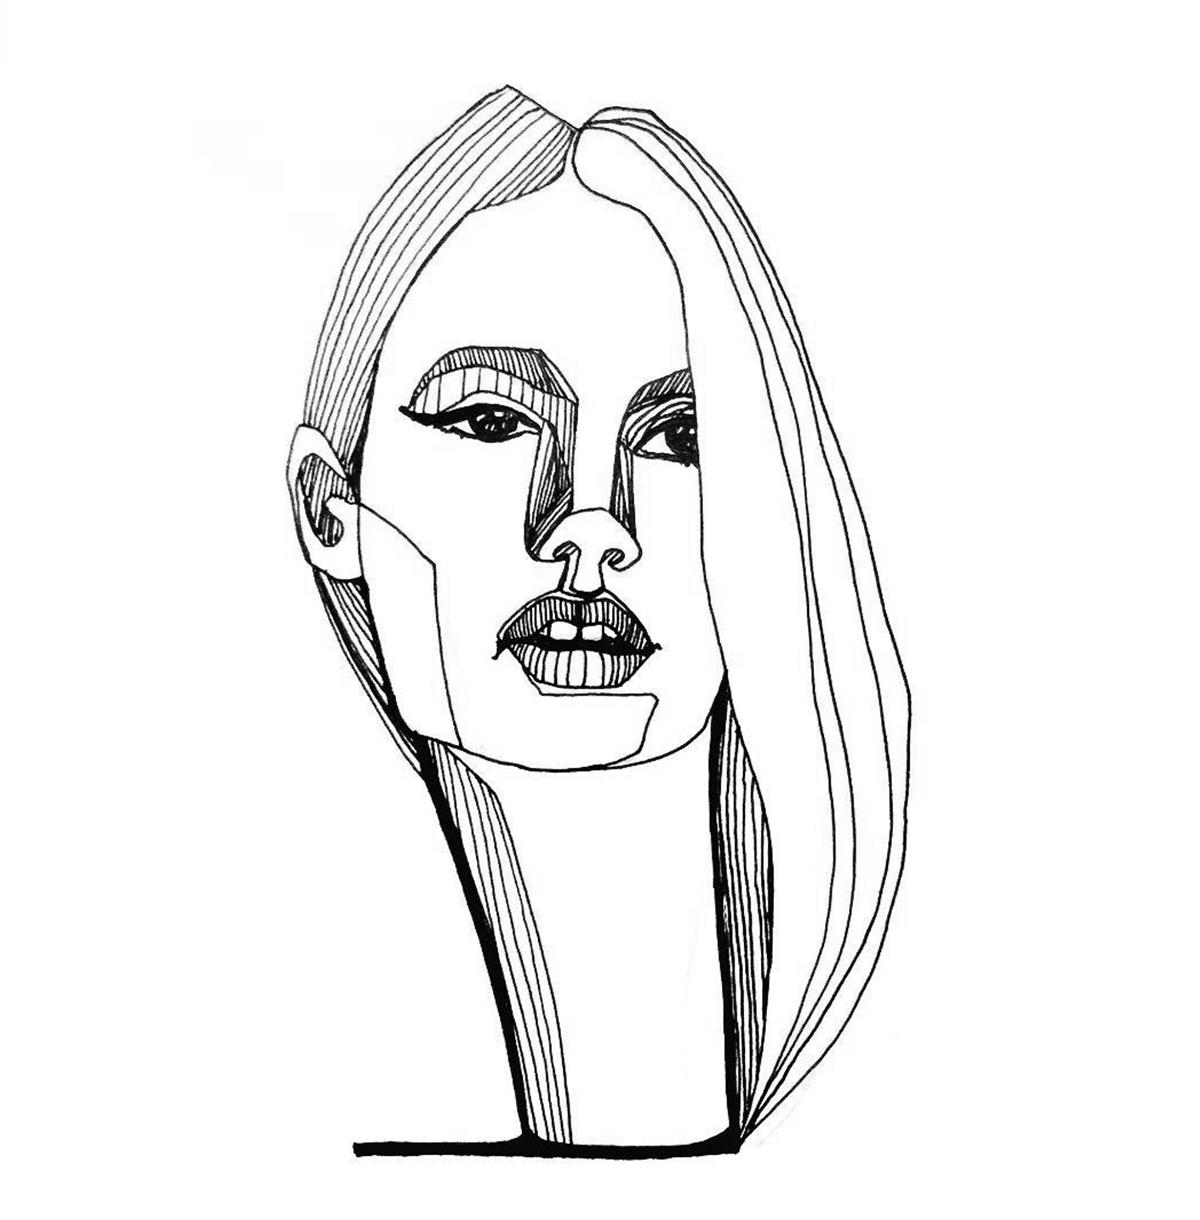 swanneck ink ILLUSTRATION  portrait line art sketches black and white stripes Swan Necks